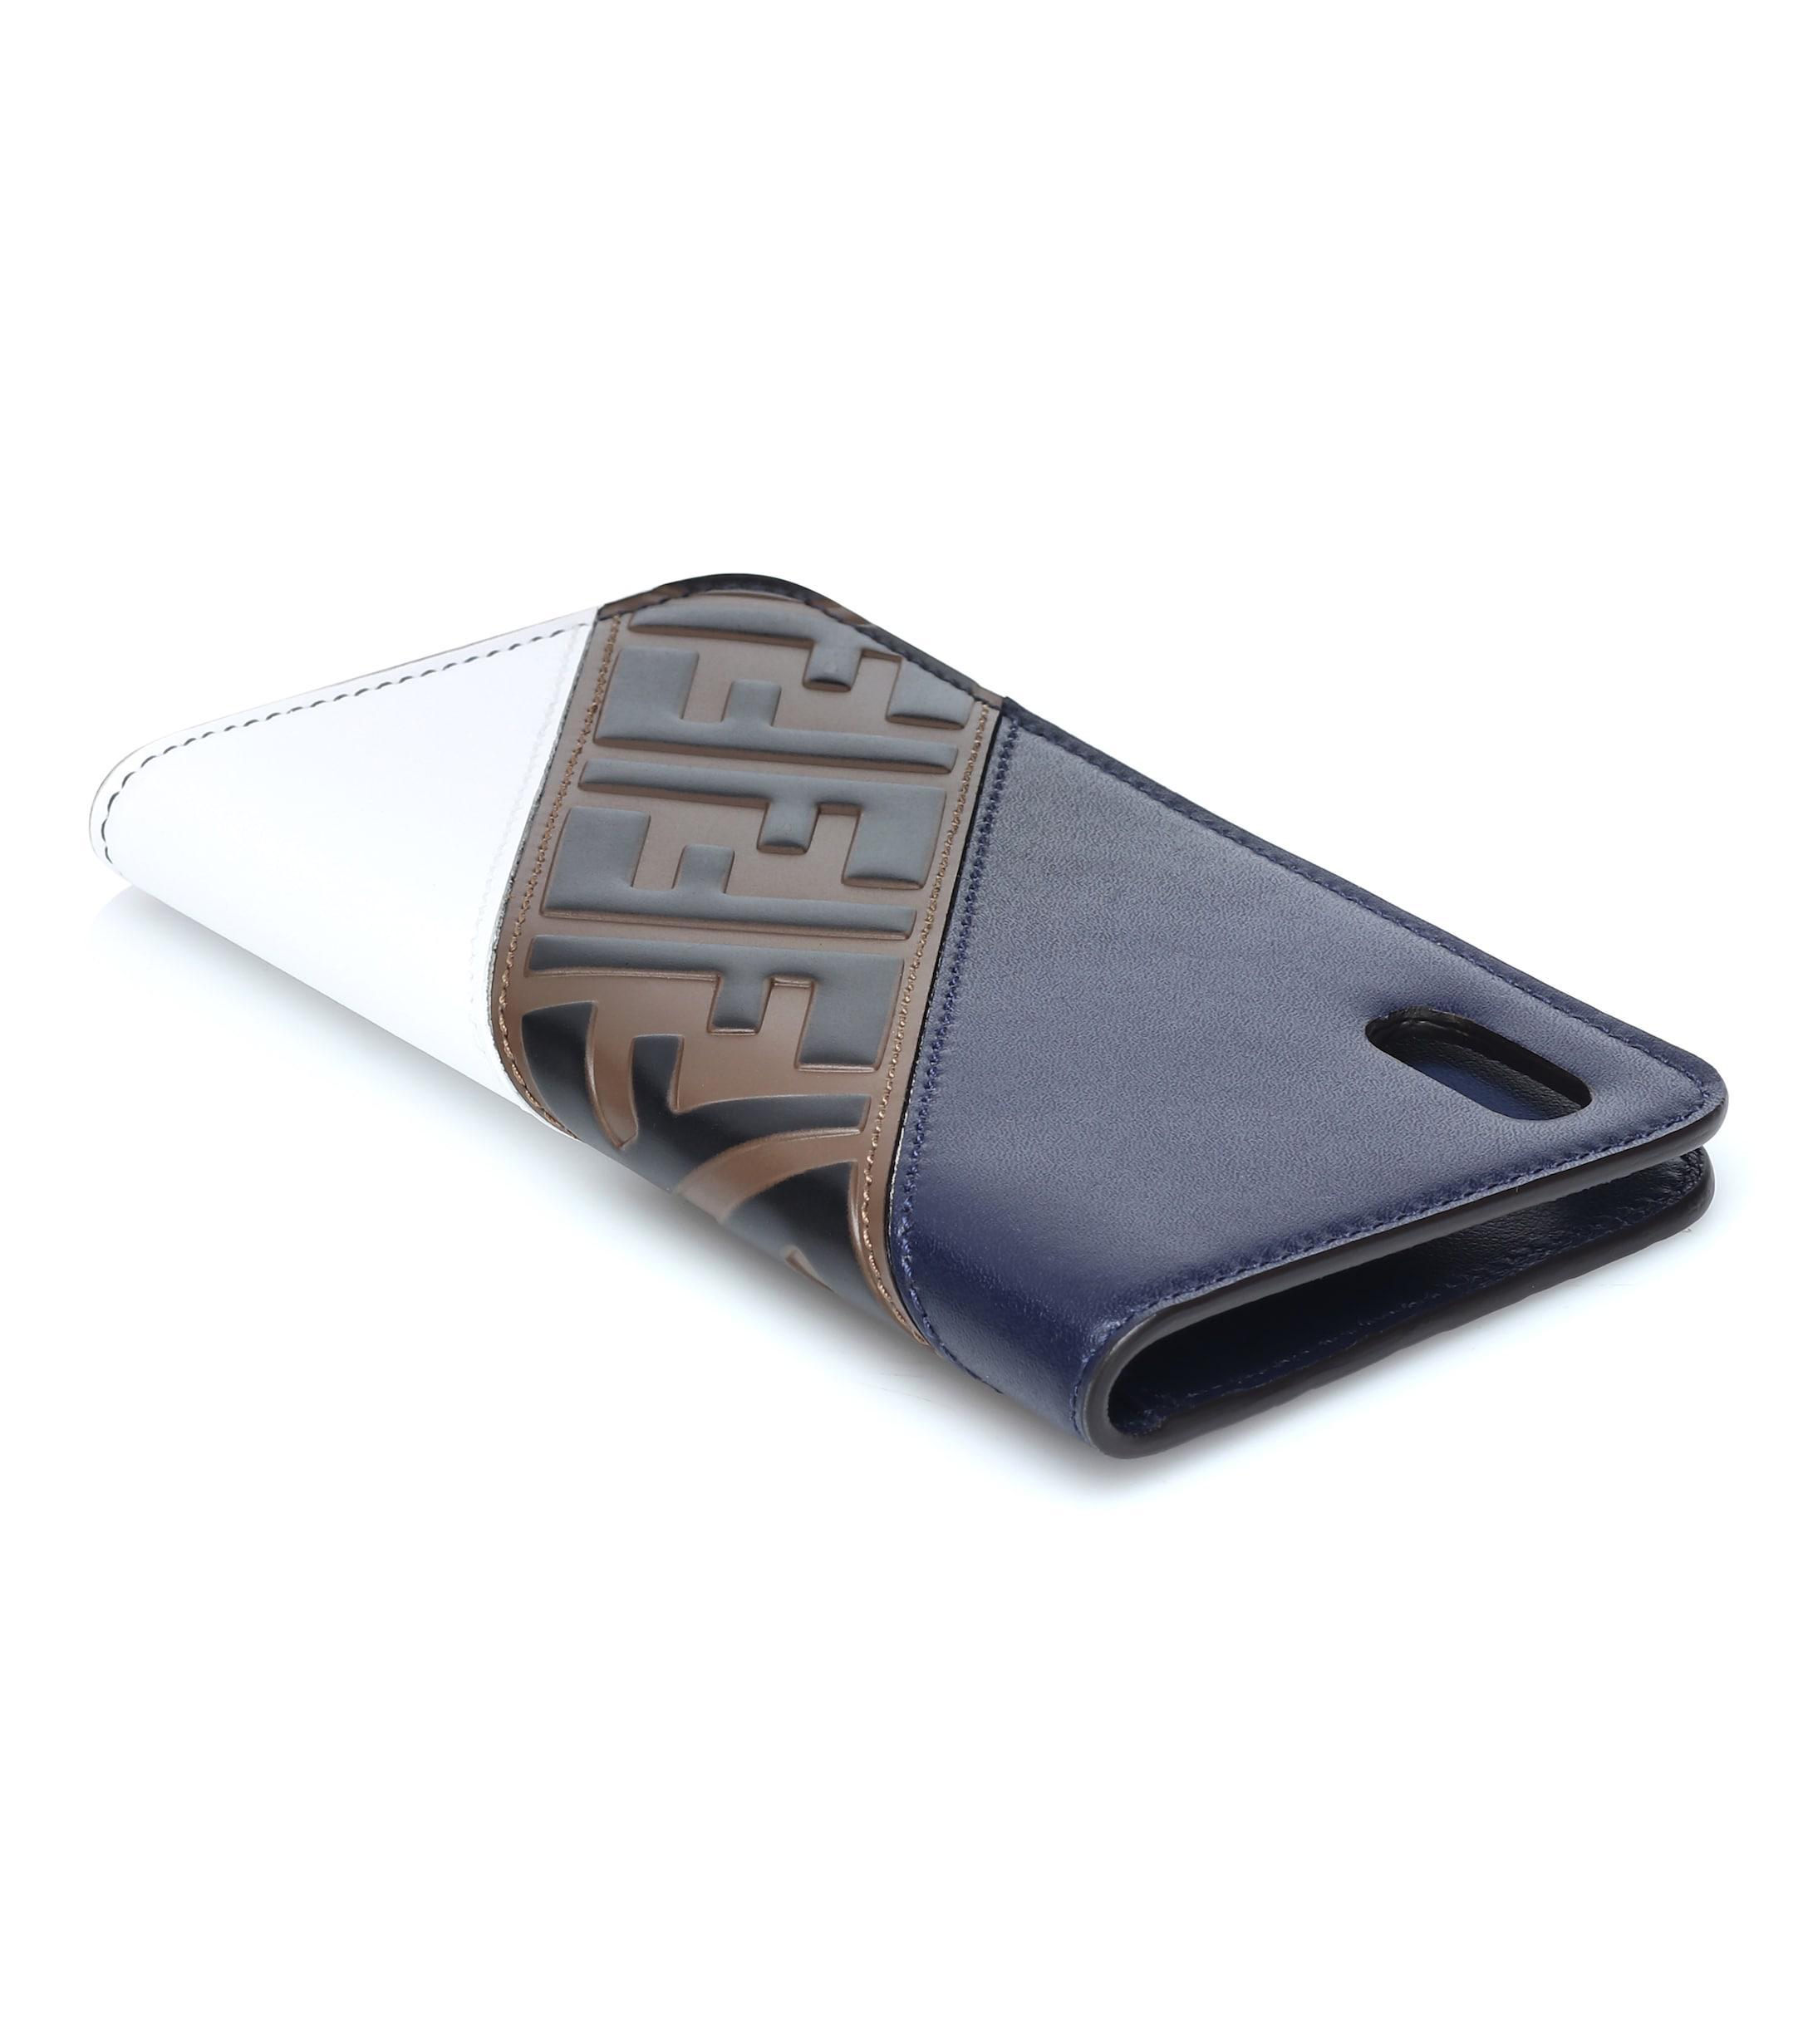 cb10811b Lyst - Fendi Mania Leather Iphone X Case